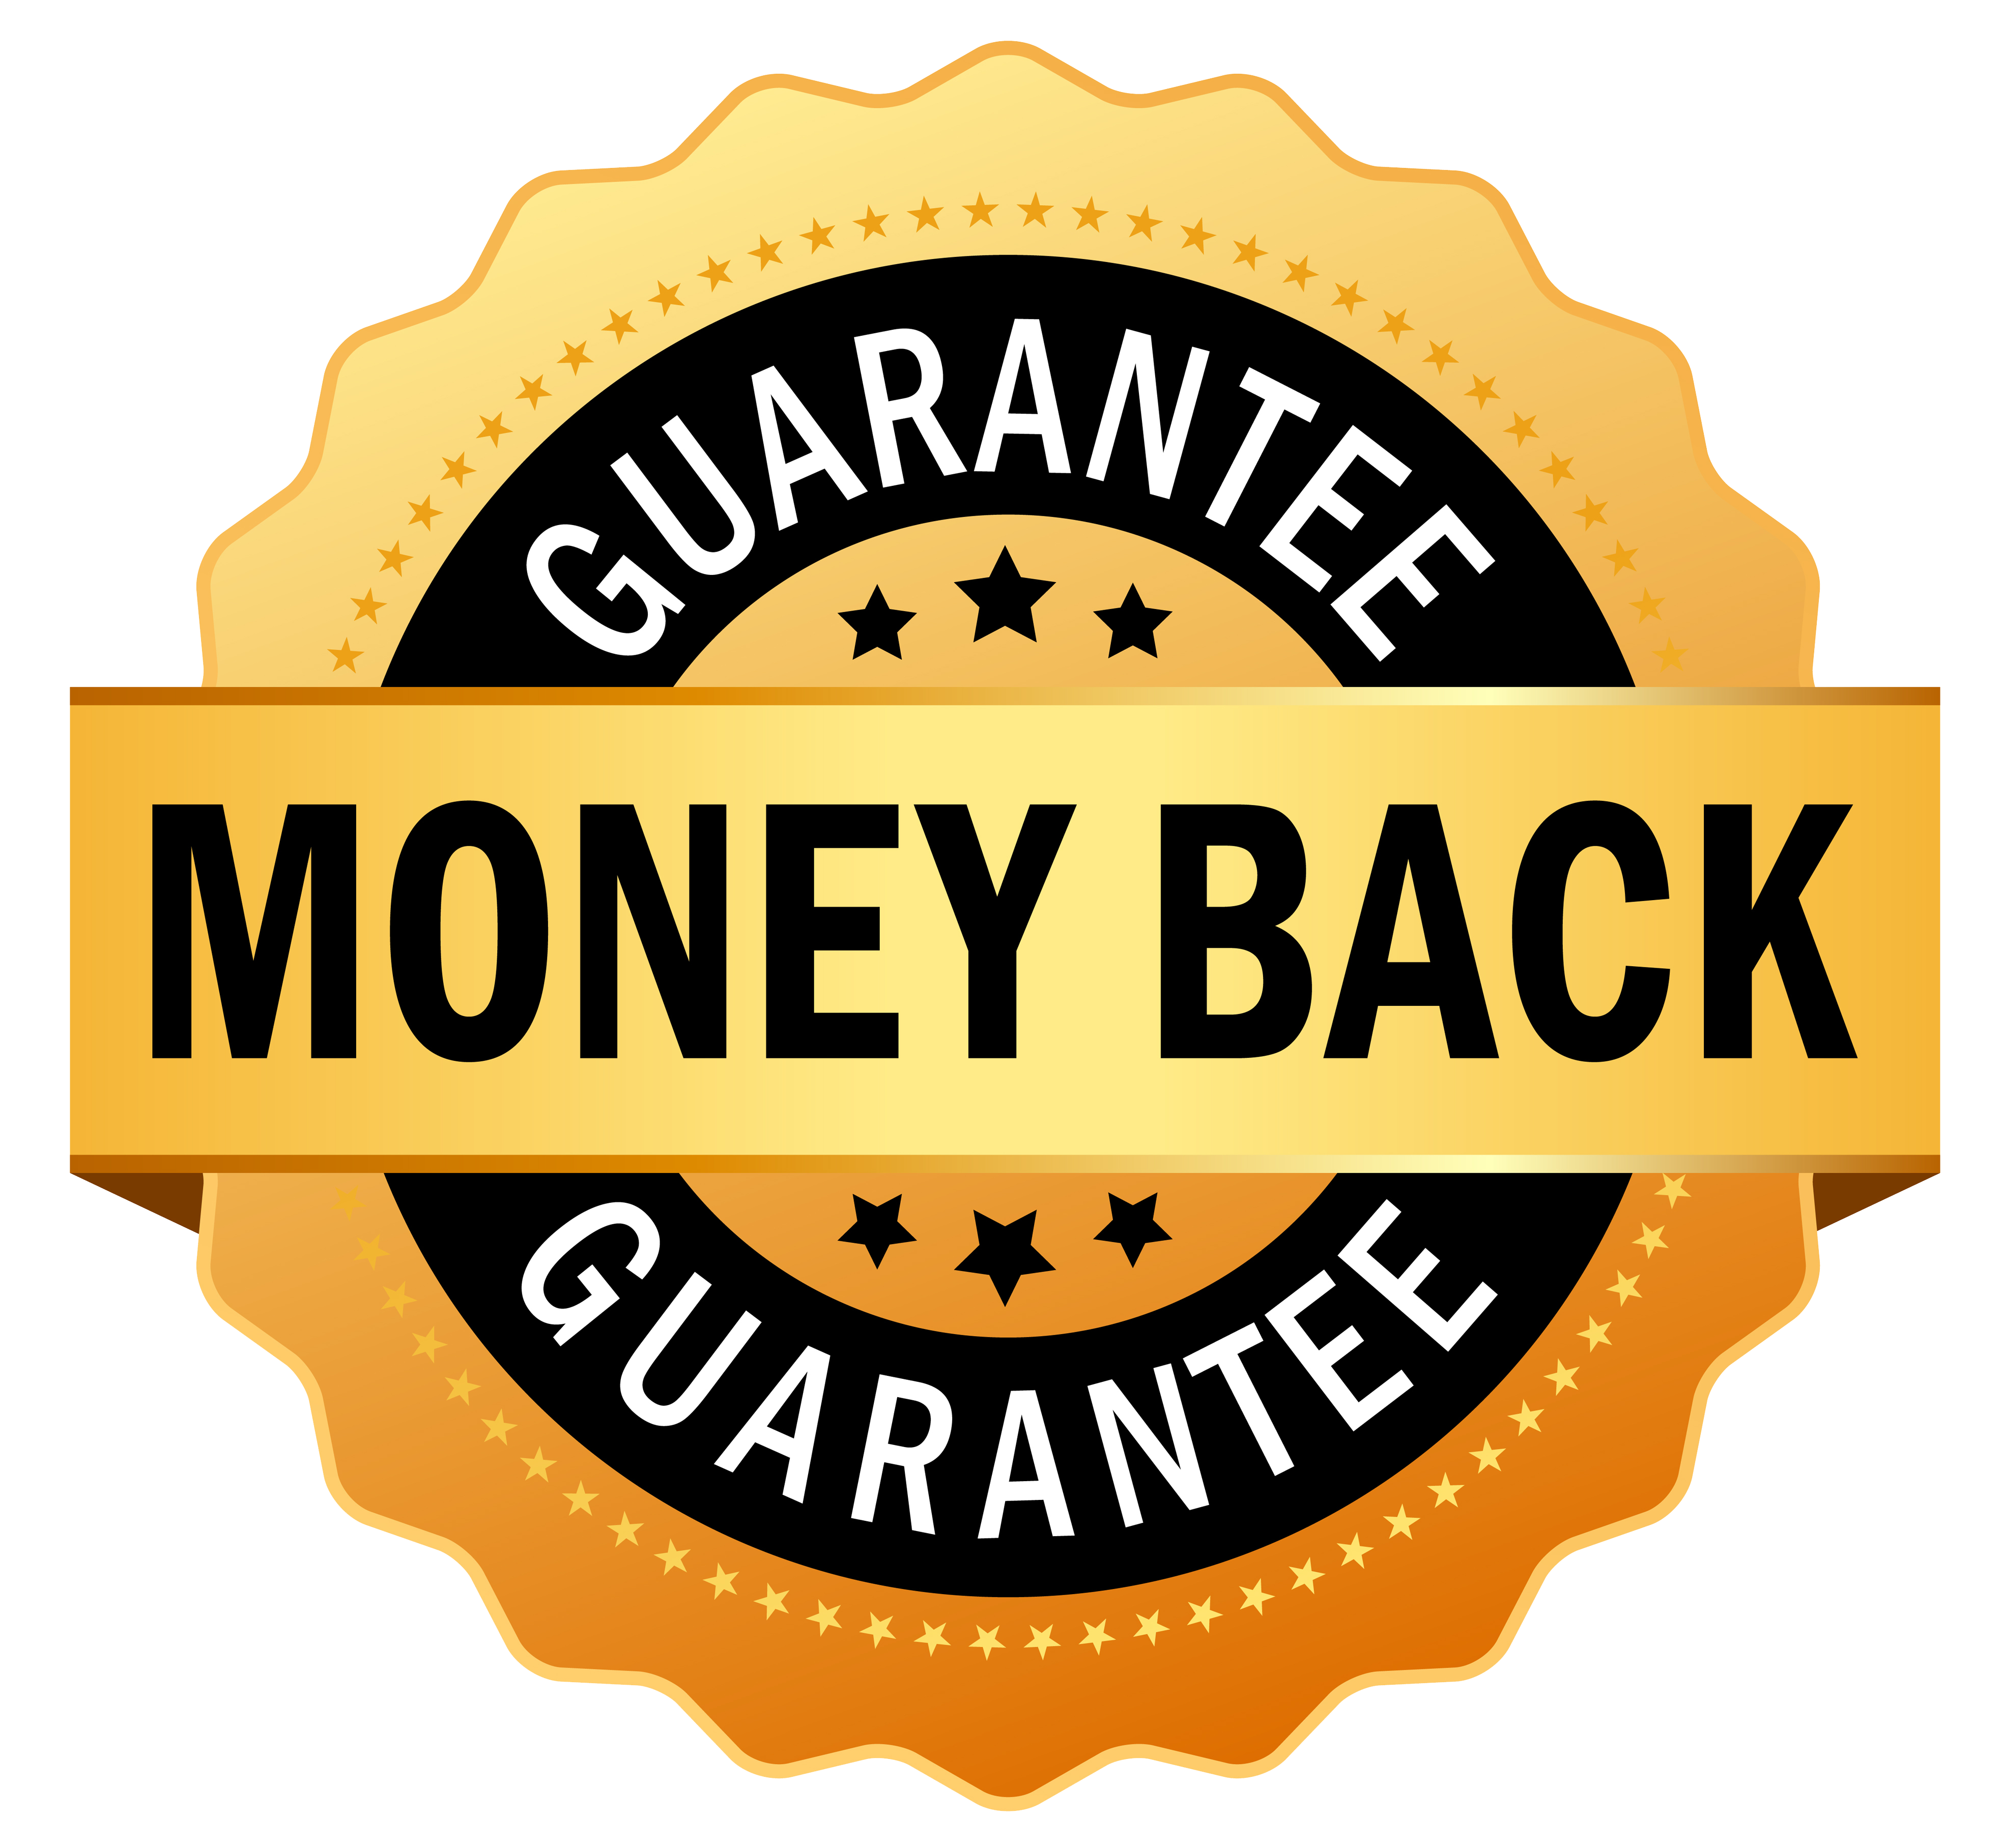 bbvd c. Money back guarantee png